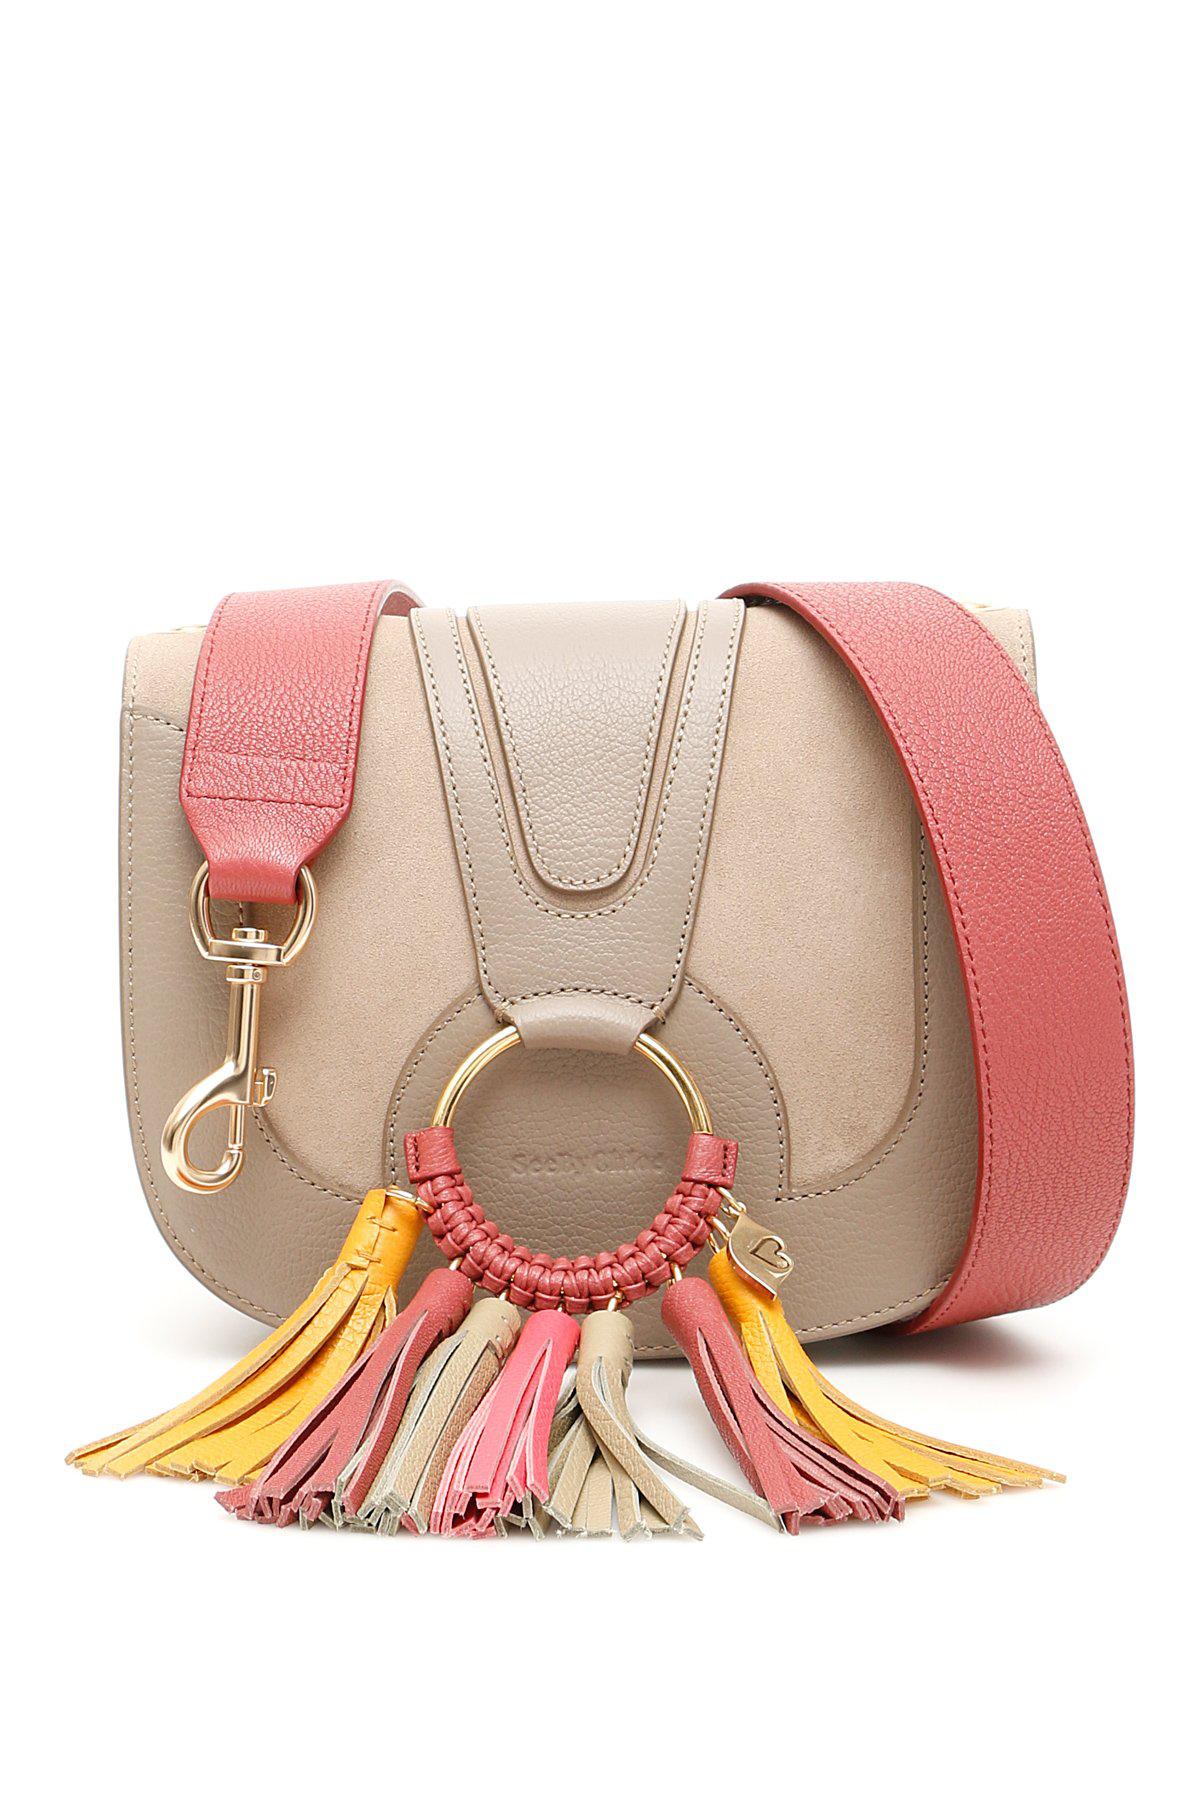 3dfda1cda1a0 See By ChloÉ Hana Shoulder Bag In Multi